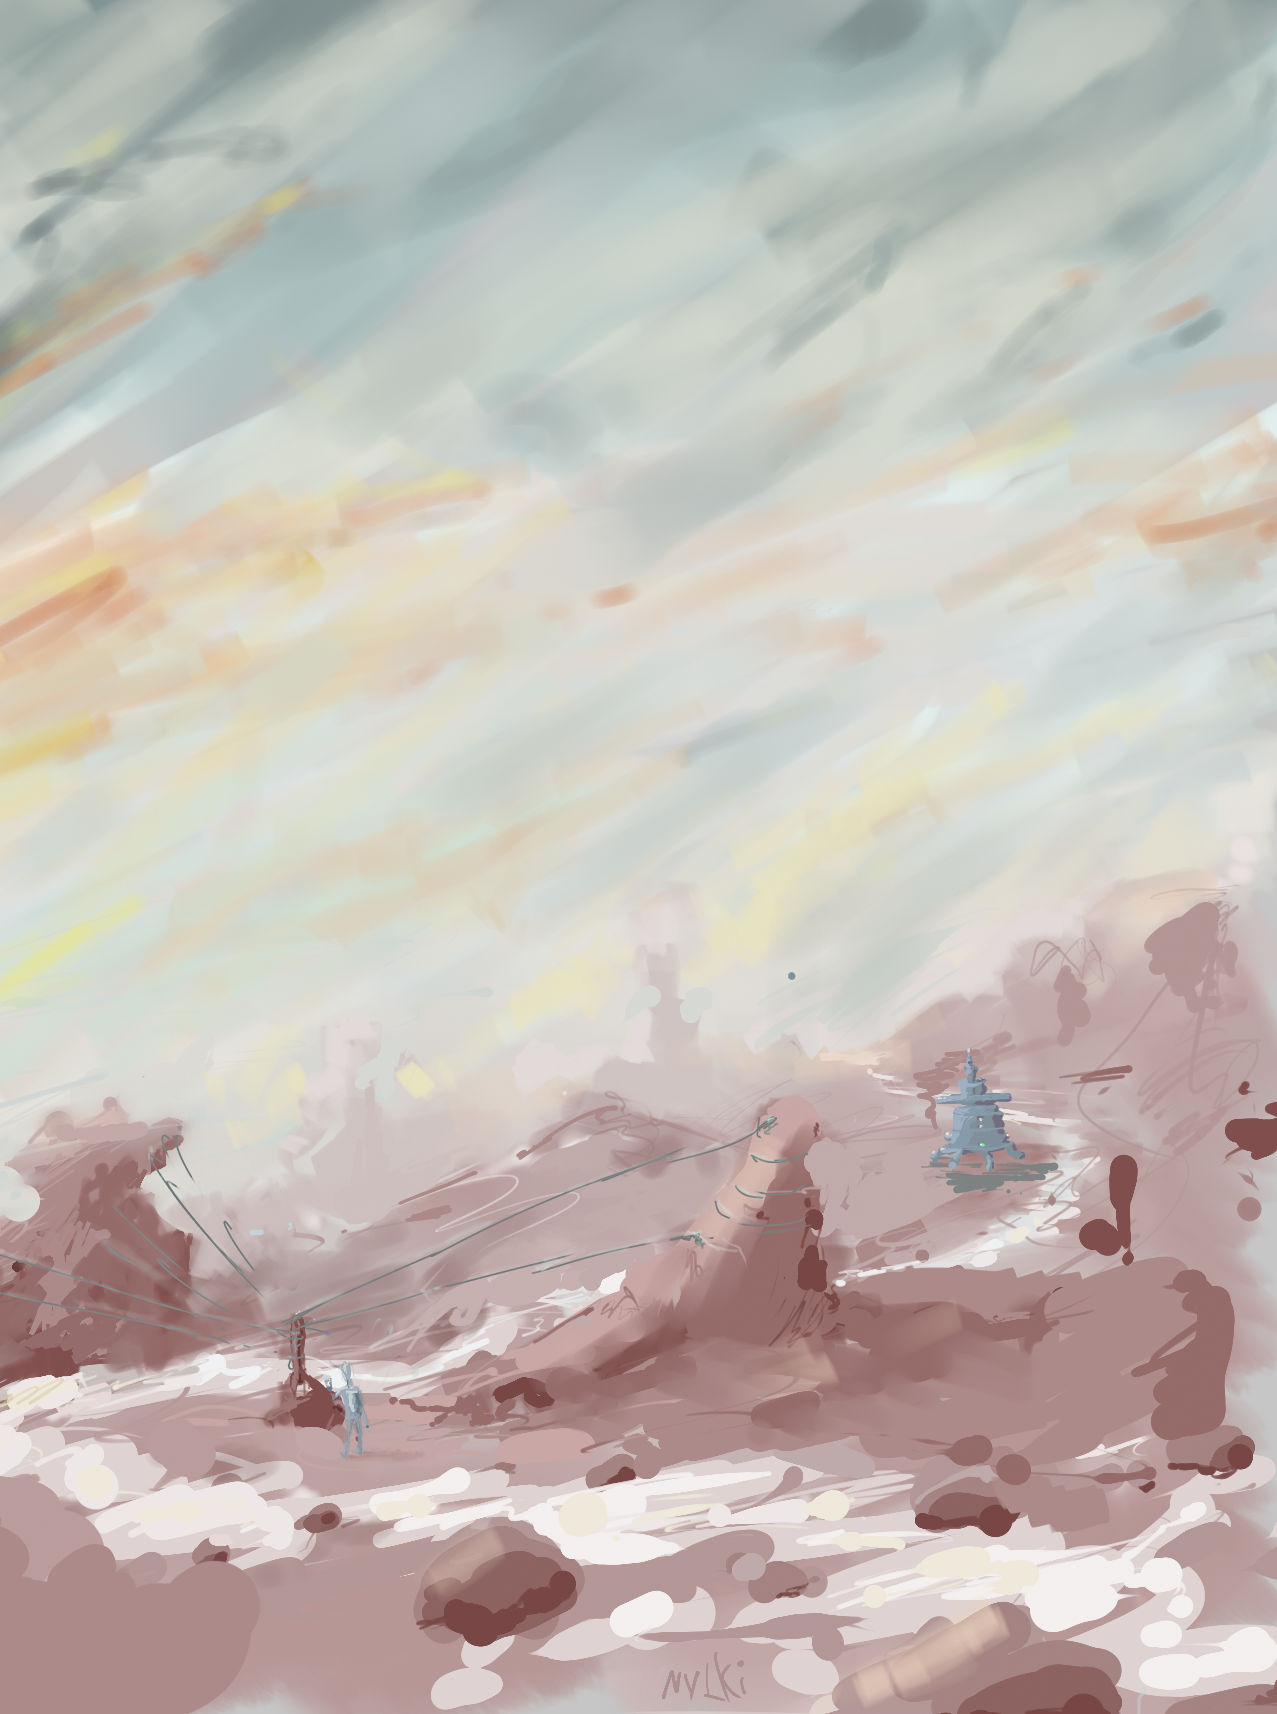 Reddish Hills by tombru